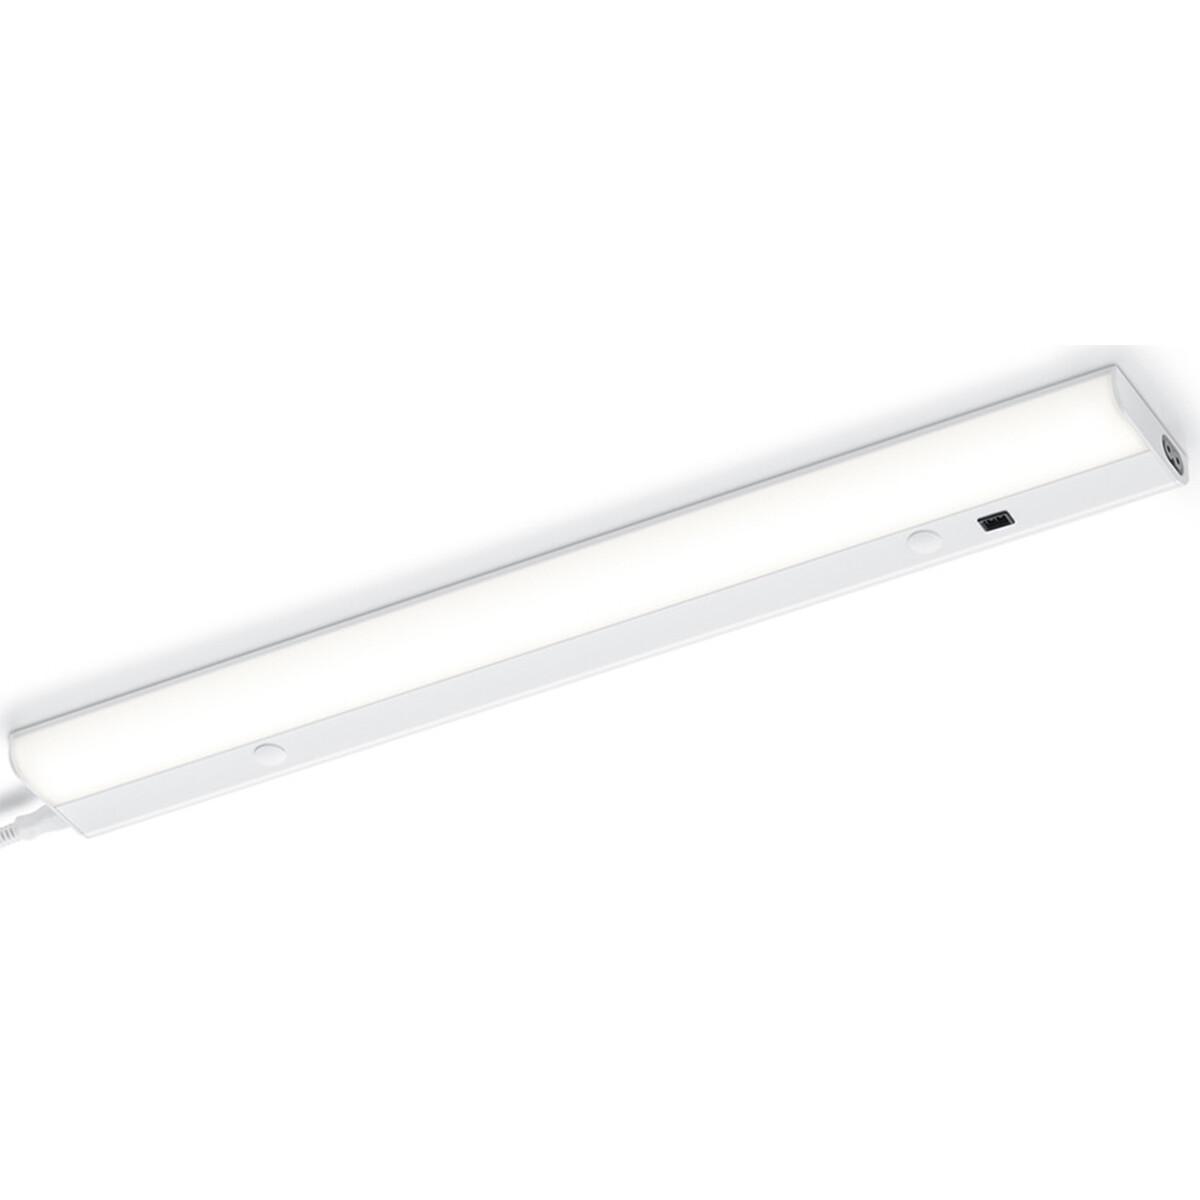 LED Wandlamp - Trion Simi - 10W - Warm Wit 3000K - Rechthoek - Mat Wit - Aluminium